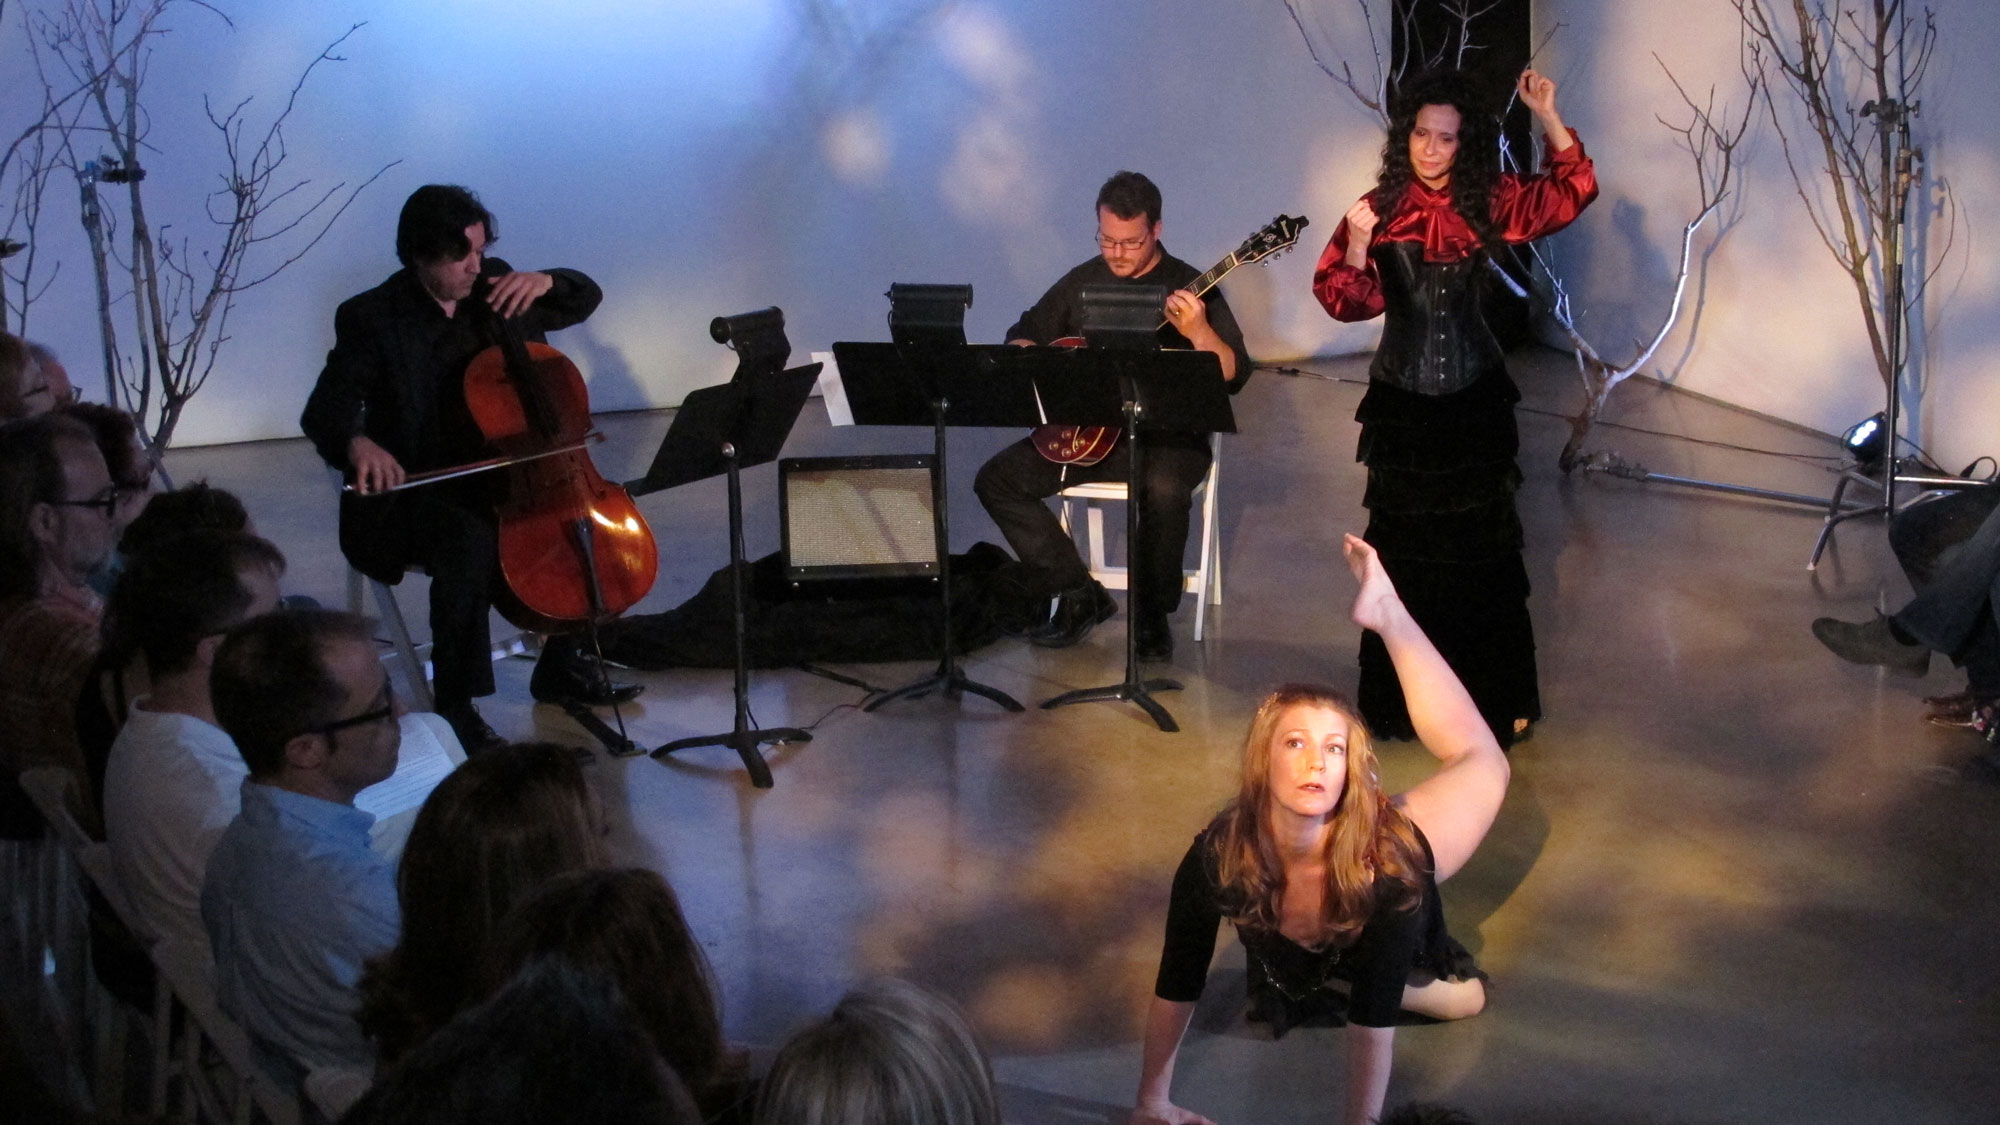 ravens & radishes. Misha Penton, soprano, concept, text. George Heathco, music. Meg Brooker, dancer Daniel Saenz, cello. Photo: D. Nickerson.